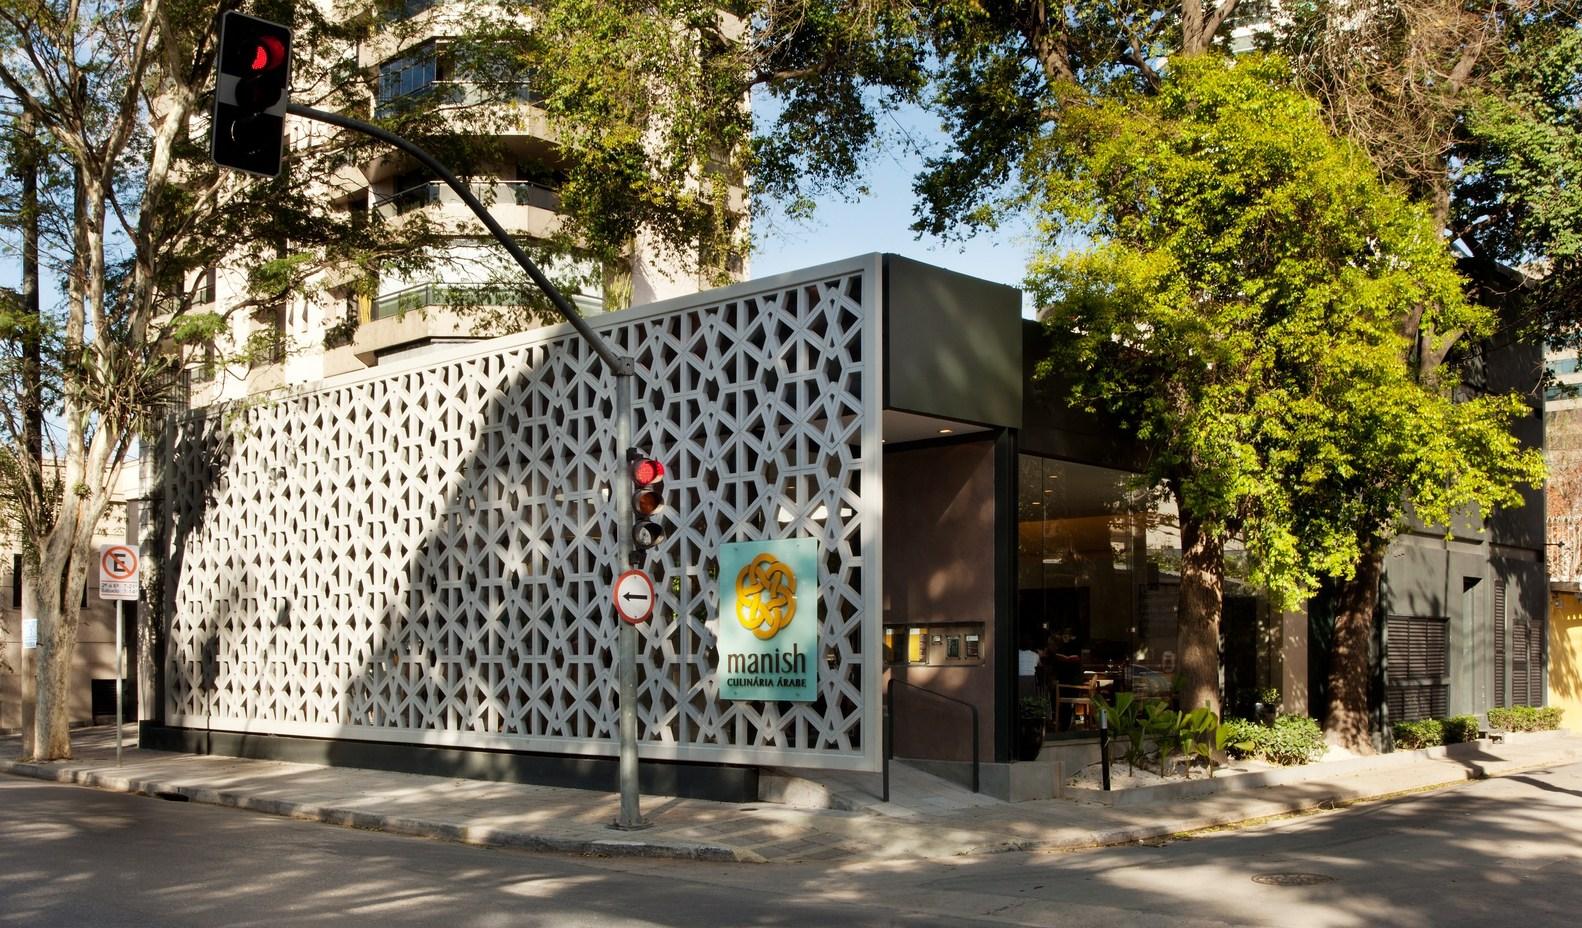 Projeto Restaurante Manish: Fachada